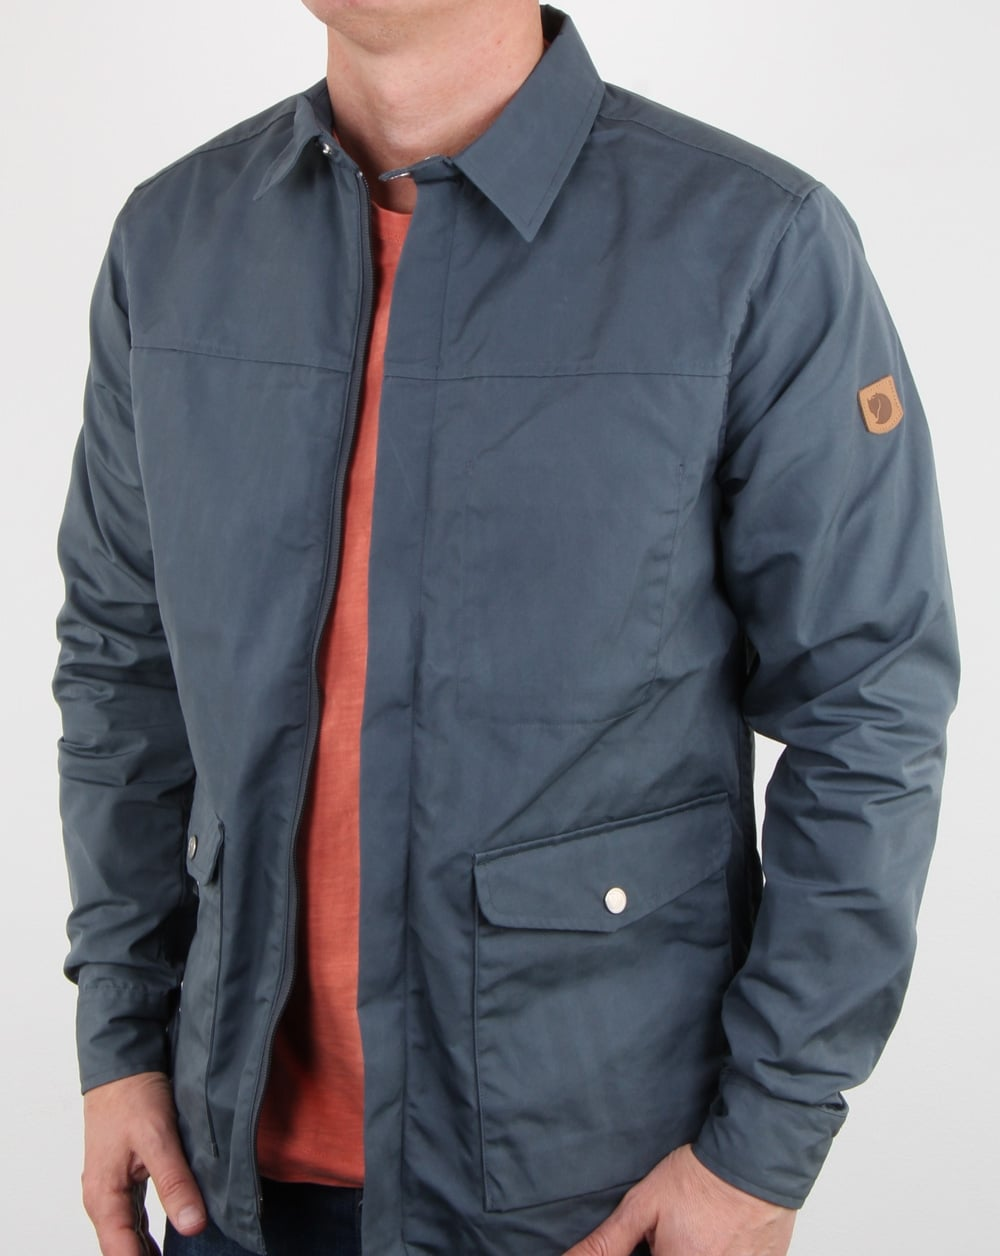 Fjallraven Greenland Shirt Jacket Dusk, Mens, Jacket, Shirt